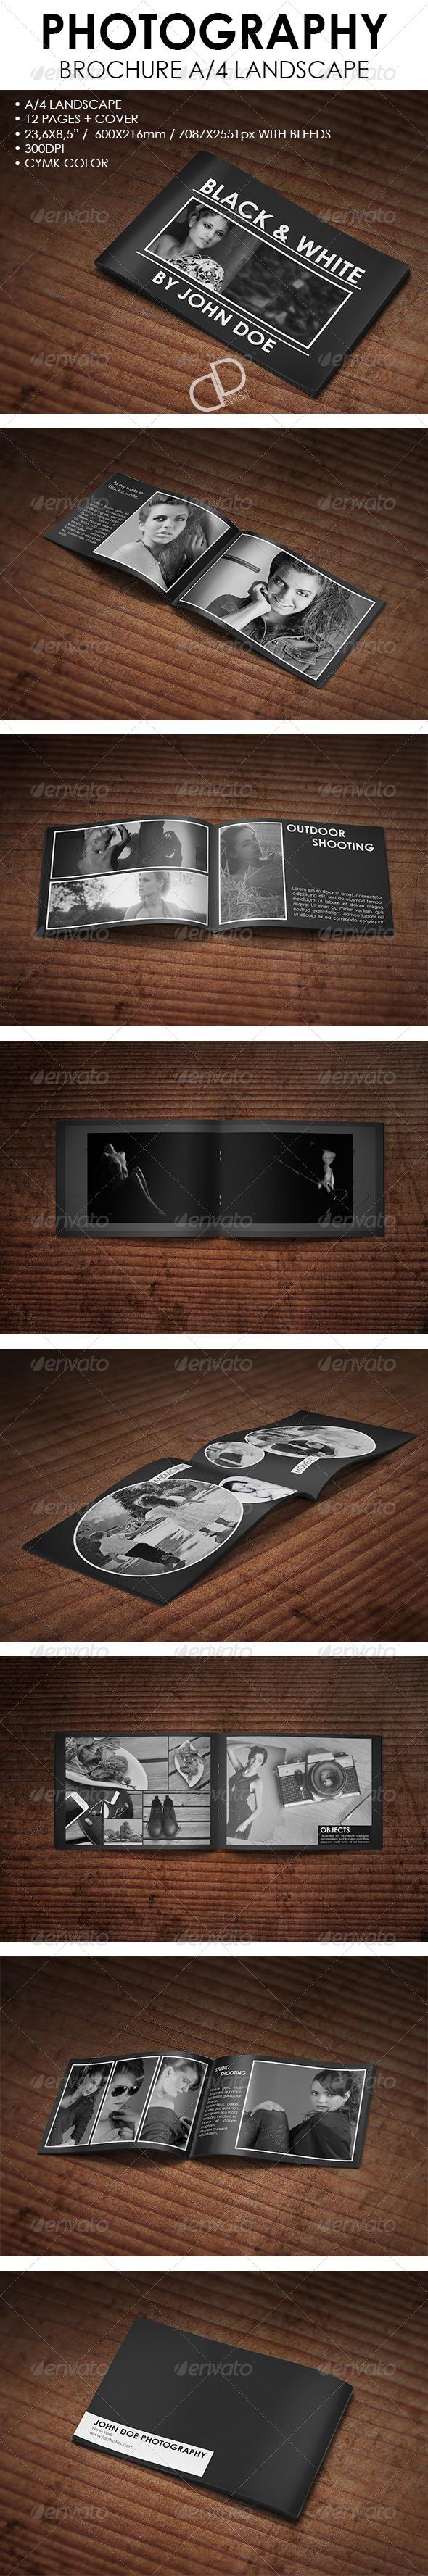 Photography Bochure A4 Landscape - Brochures Print Templates